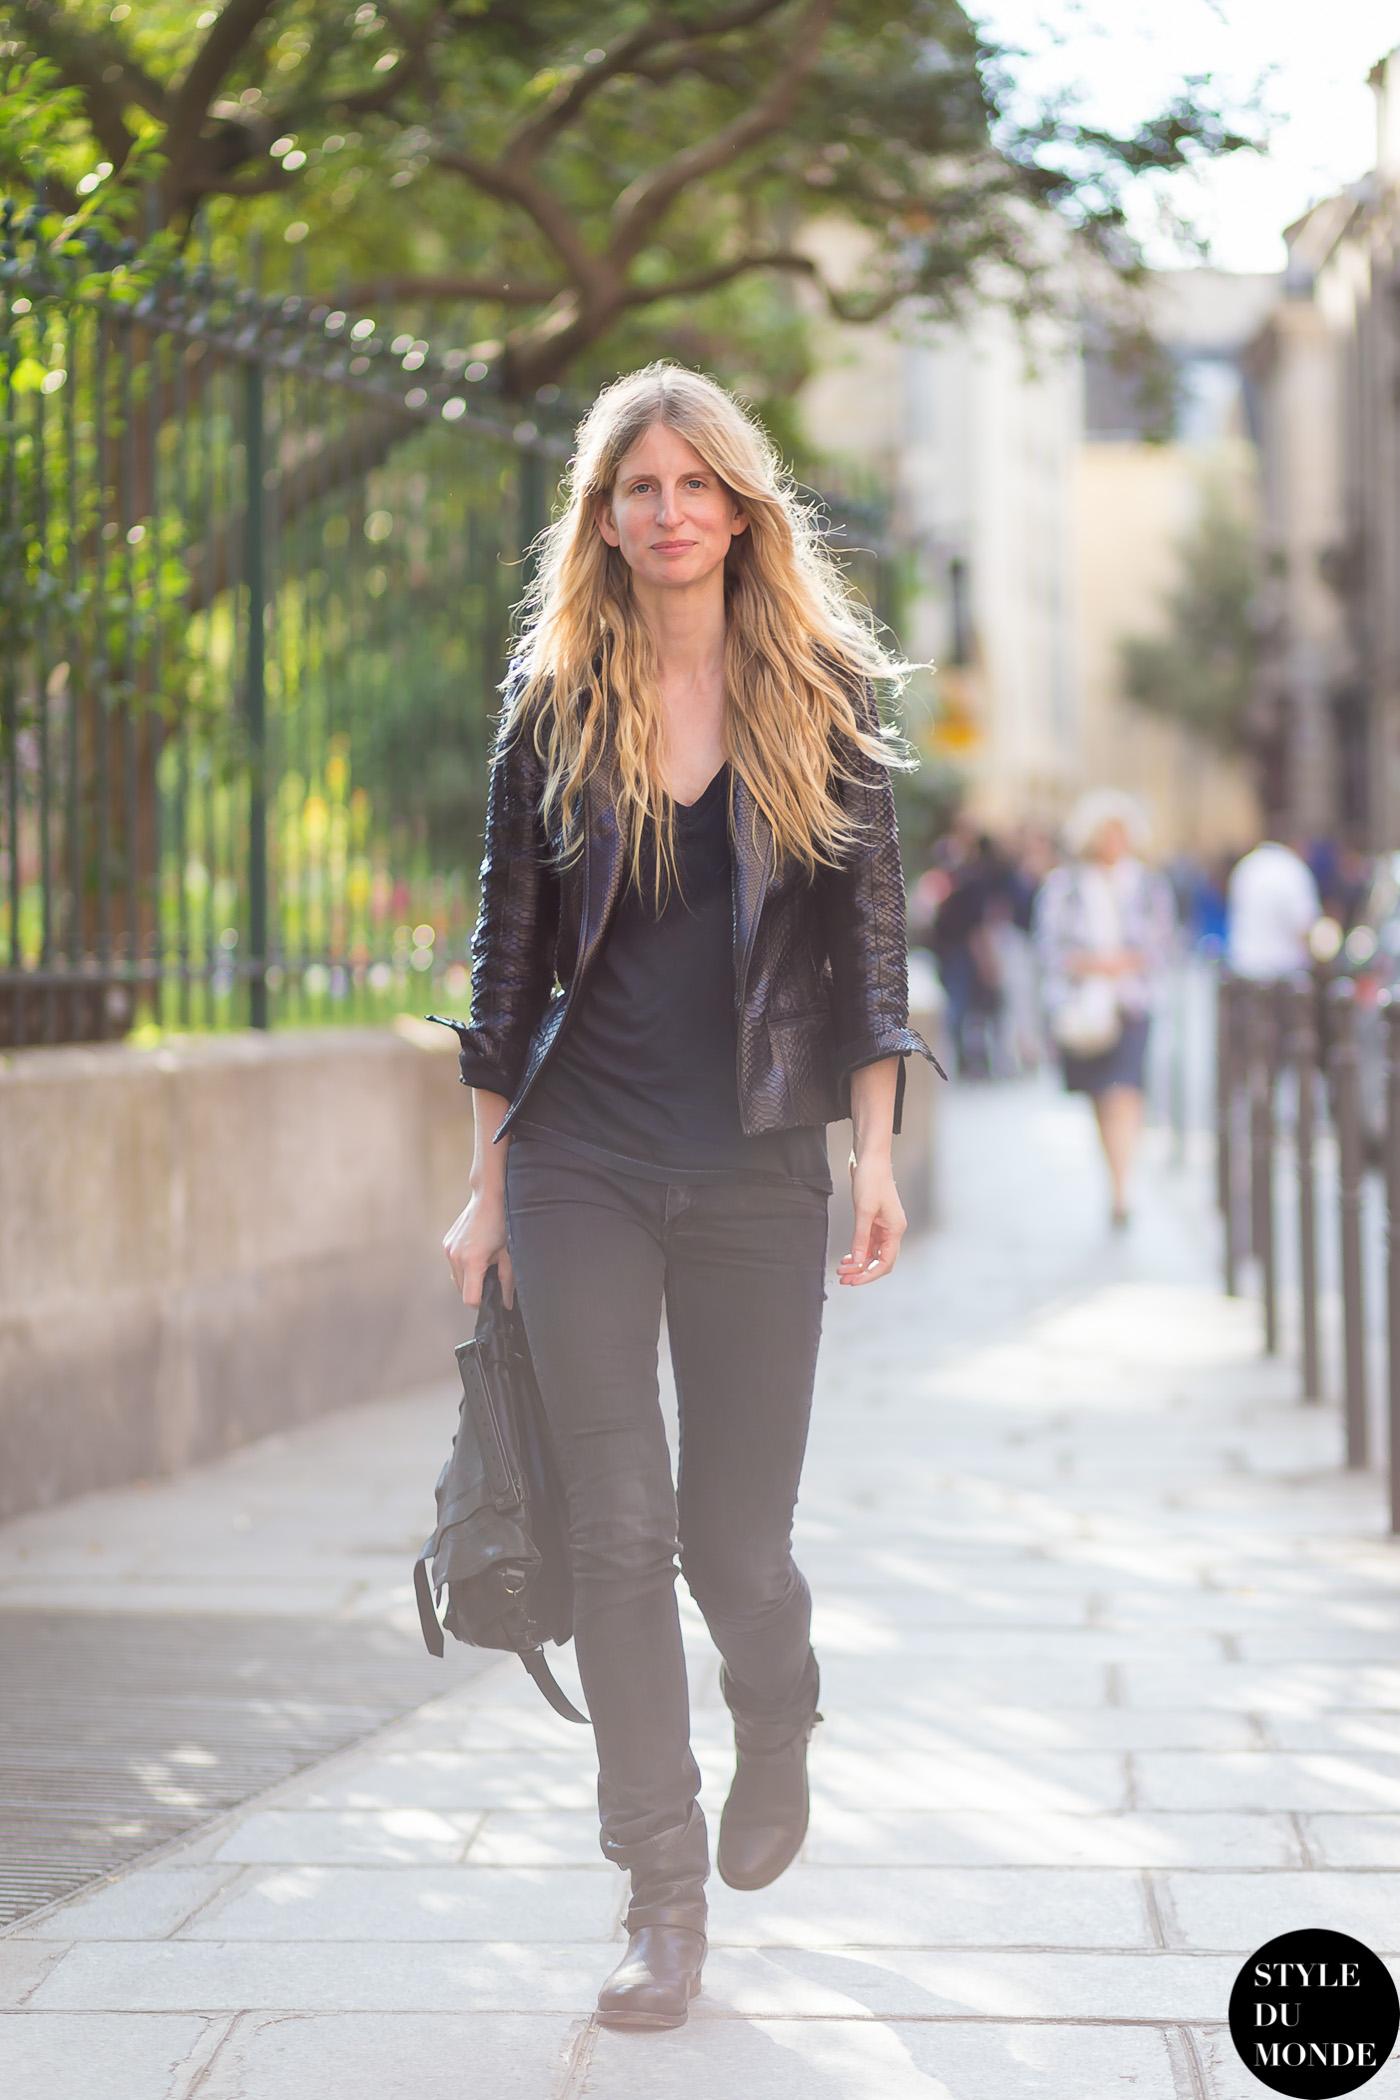 super cute 920ba d7c71 Biker boots - STYLE DU MONDE | Street Style Street Fashion ...